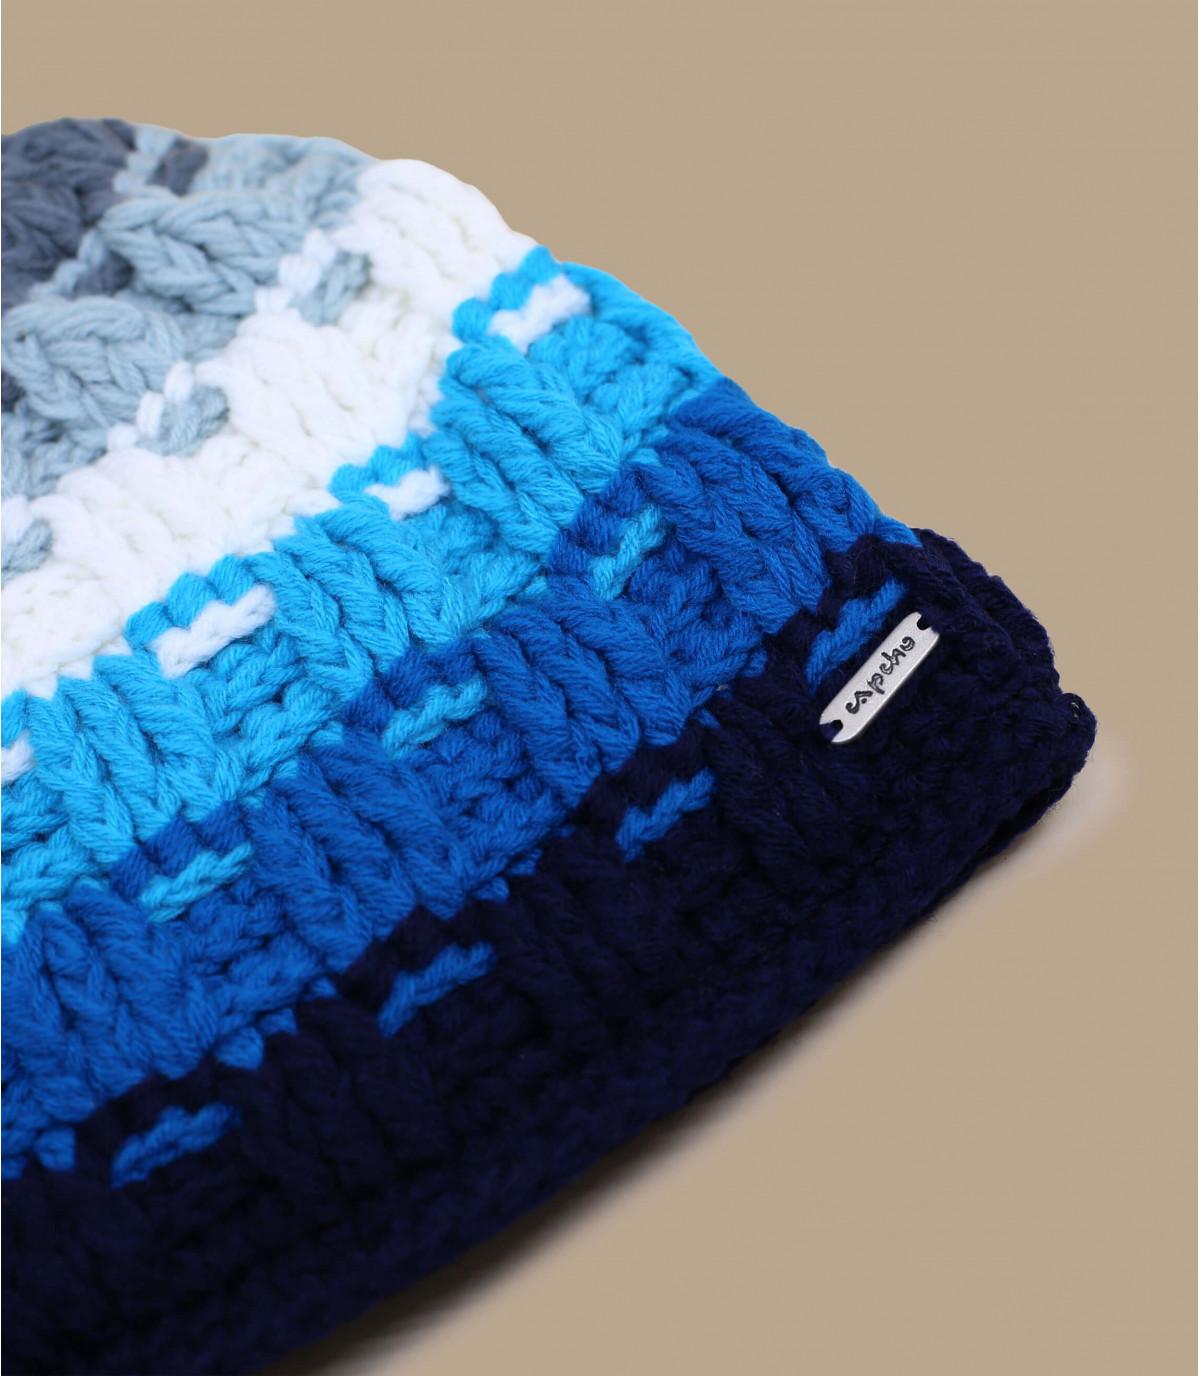 Details Platine blauwe beanie - afbeeling 3